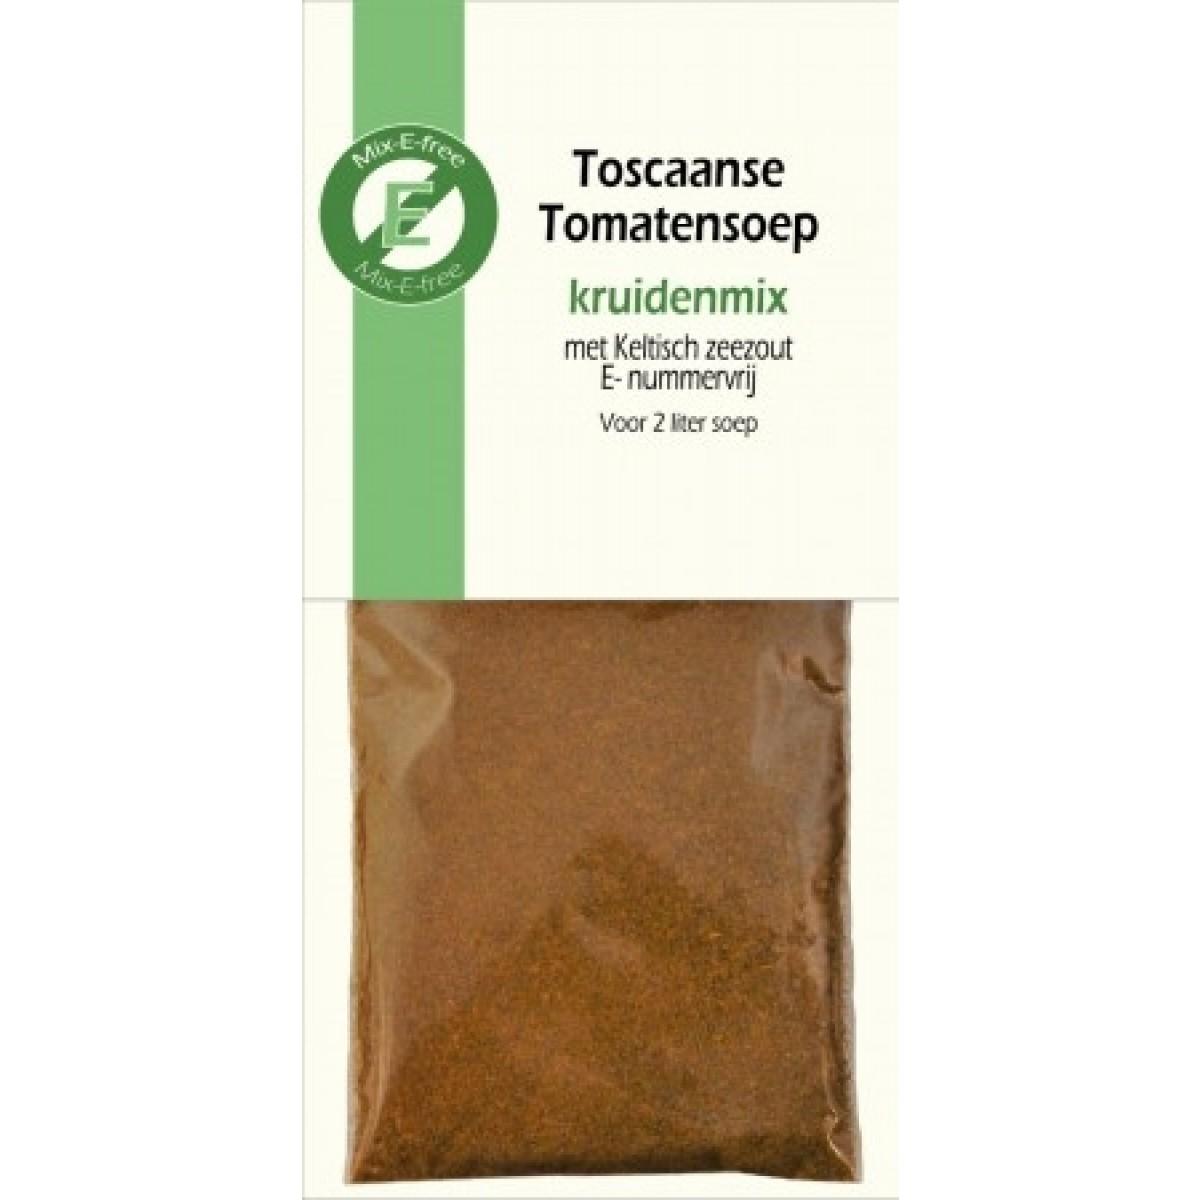 Kruidenmix Toscaanse Tomatensoep